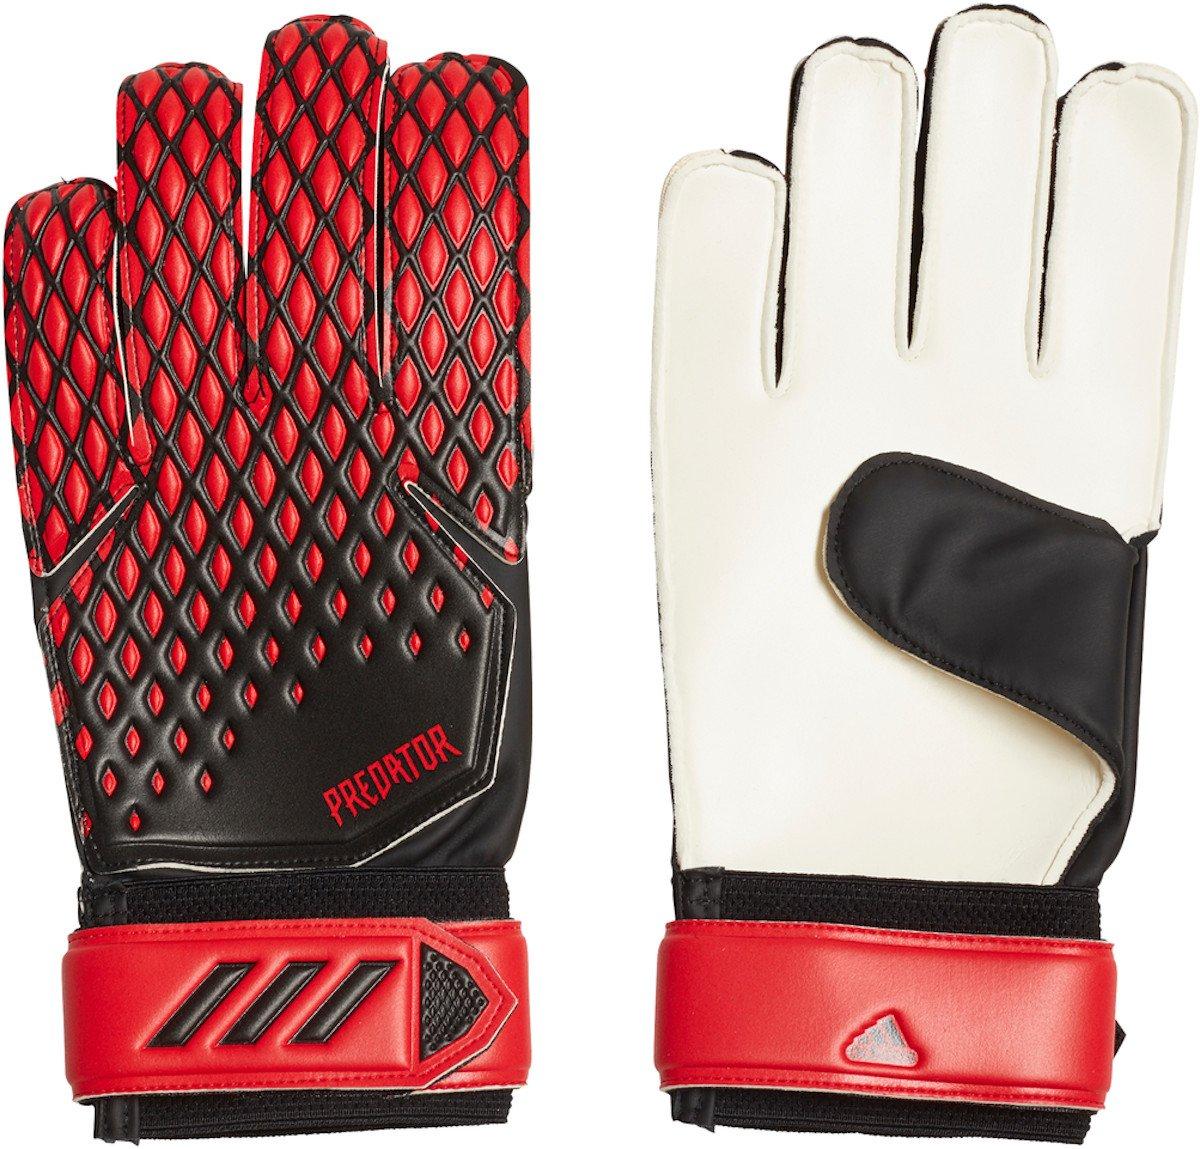 Brankářské rukavice adidas PRED GL TRN fh7295 Velikost 9,5